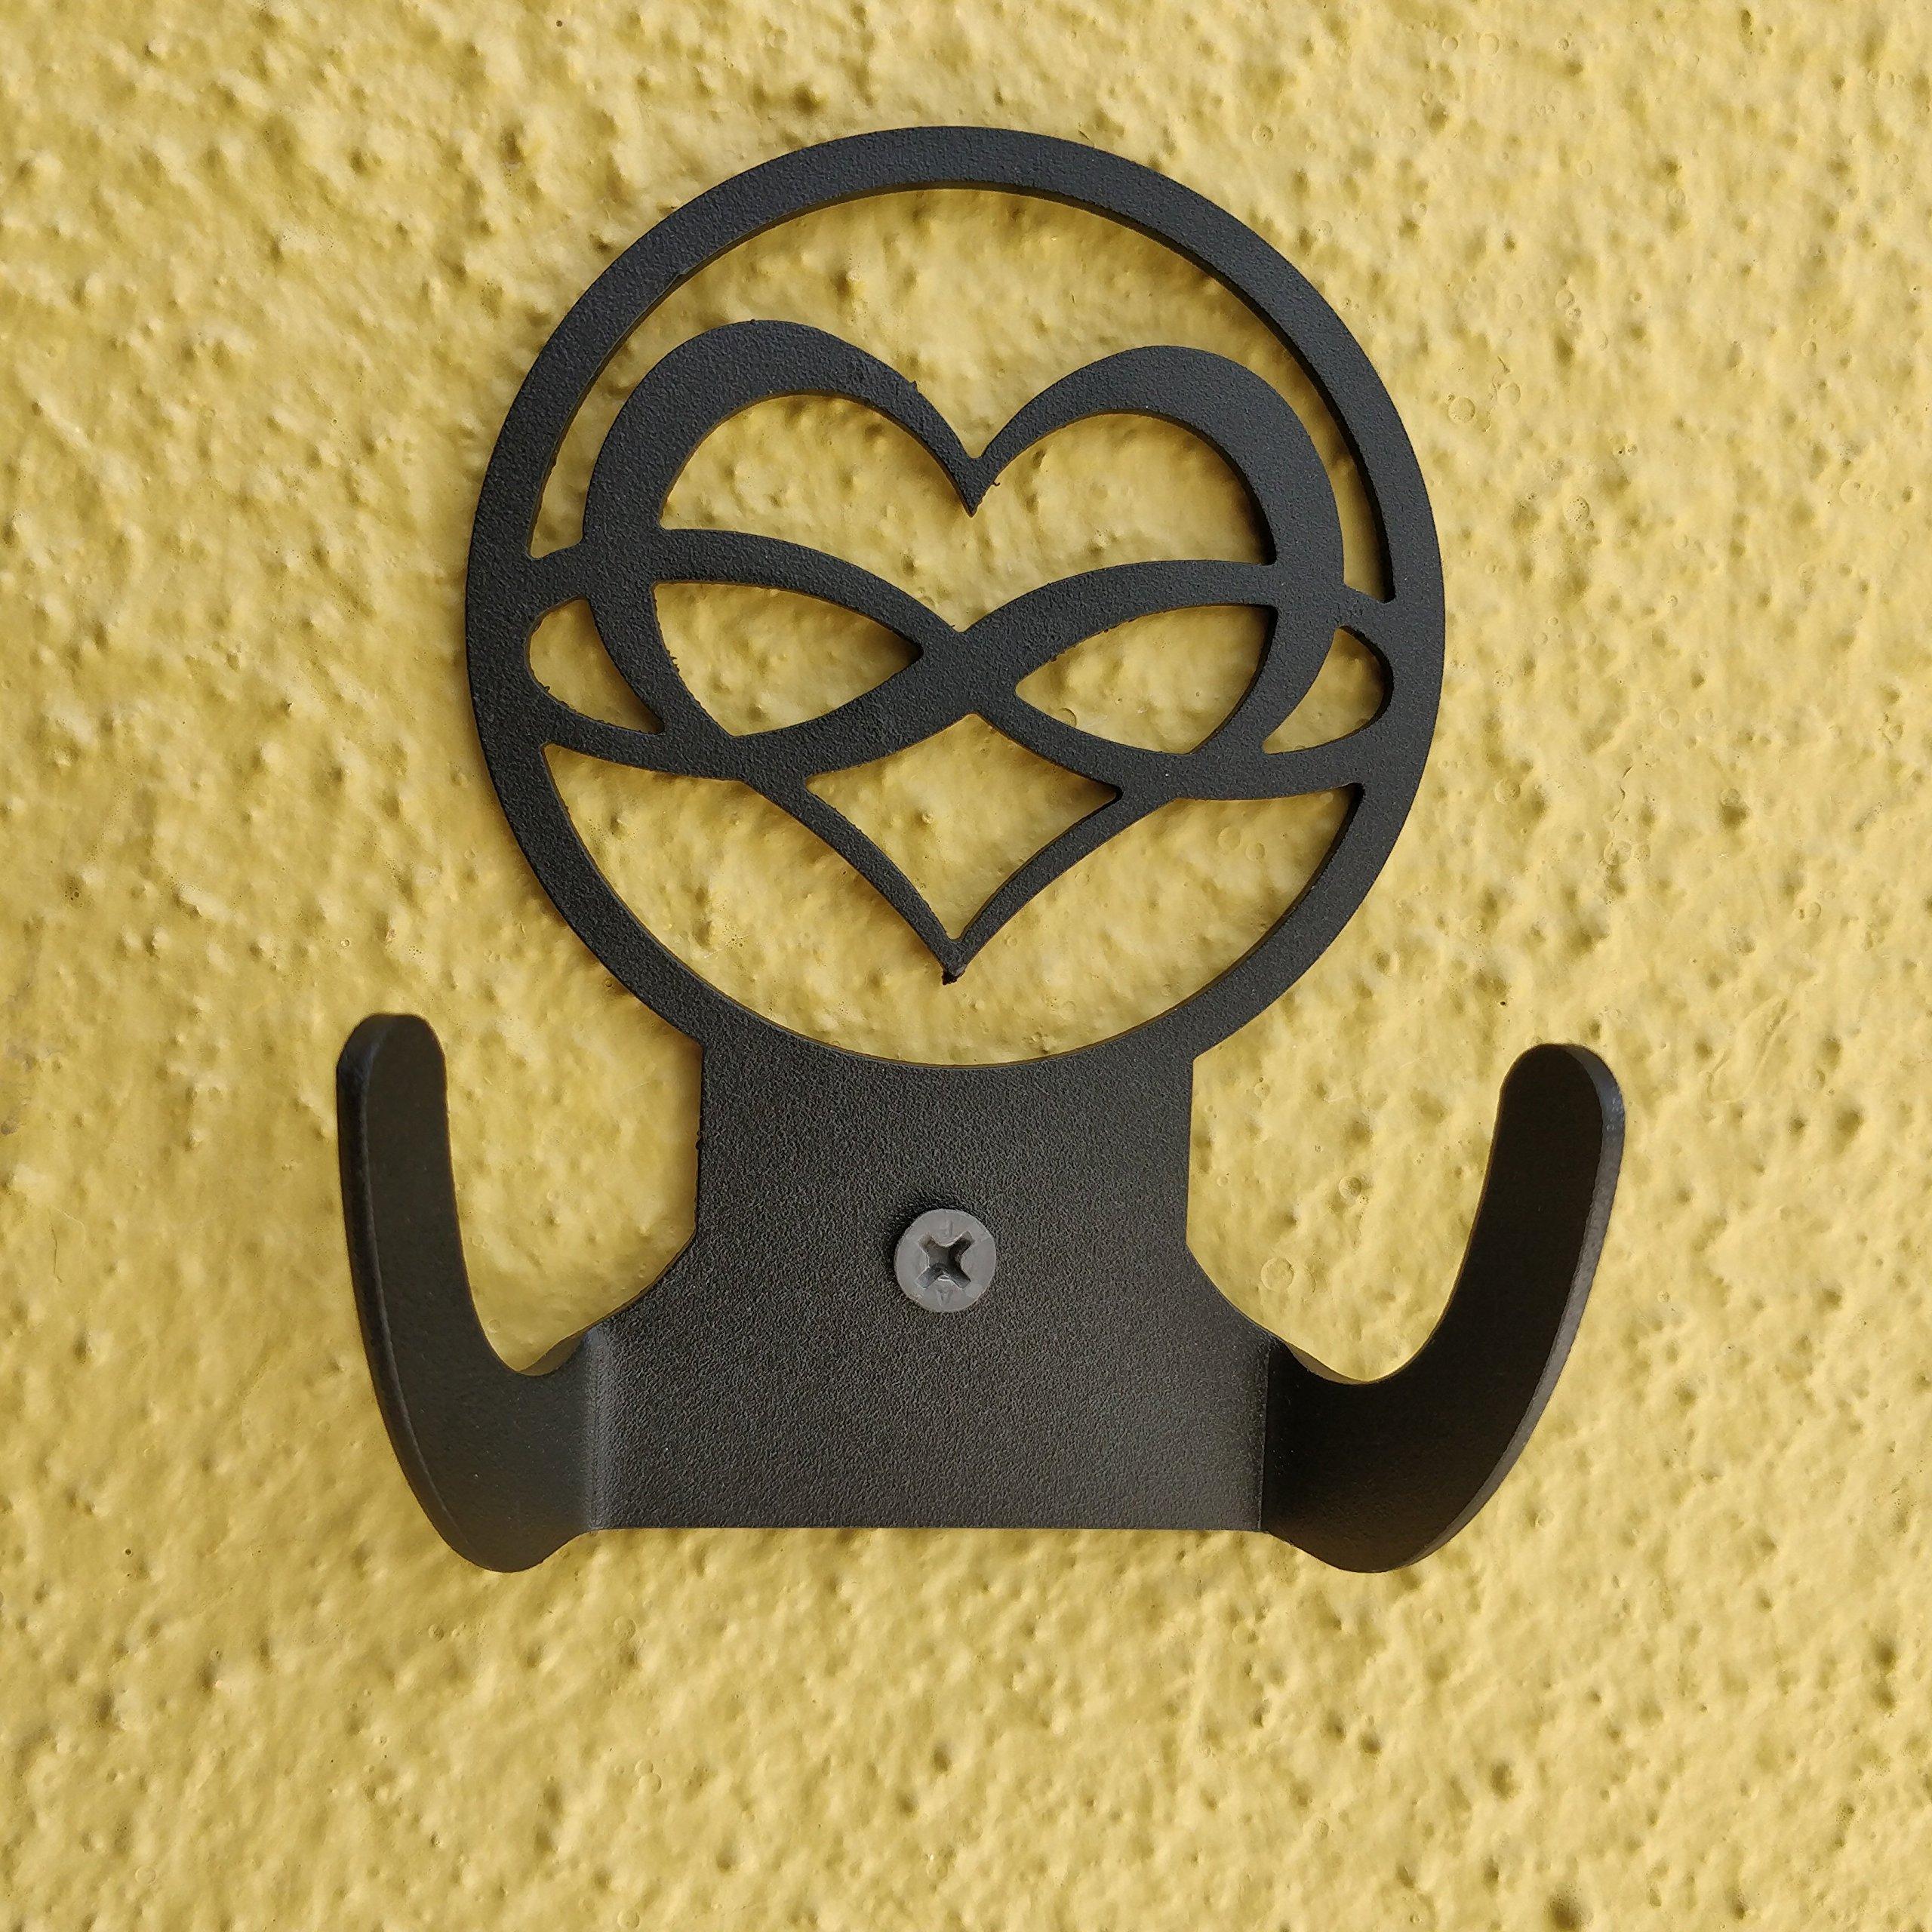 HeavenlyKraft Love Infinity Logo Steel Wall Hook Dual Holder for Living Room Coat Hat Robe Hanger Bathroom Towel Kitchen Strong Heavy Duty Garage Storage Organizer Utensil Hook Single